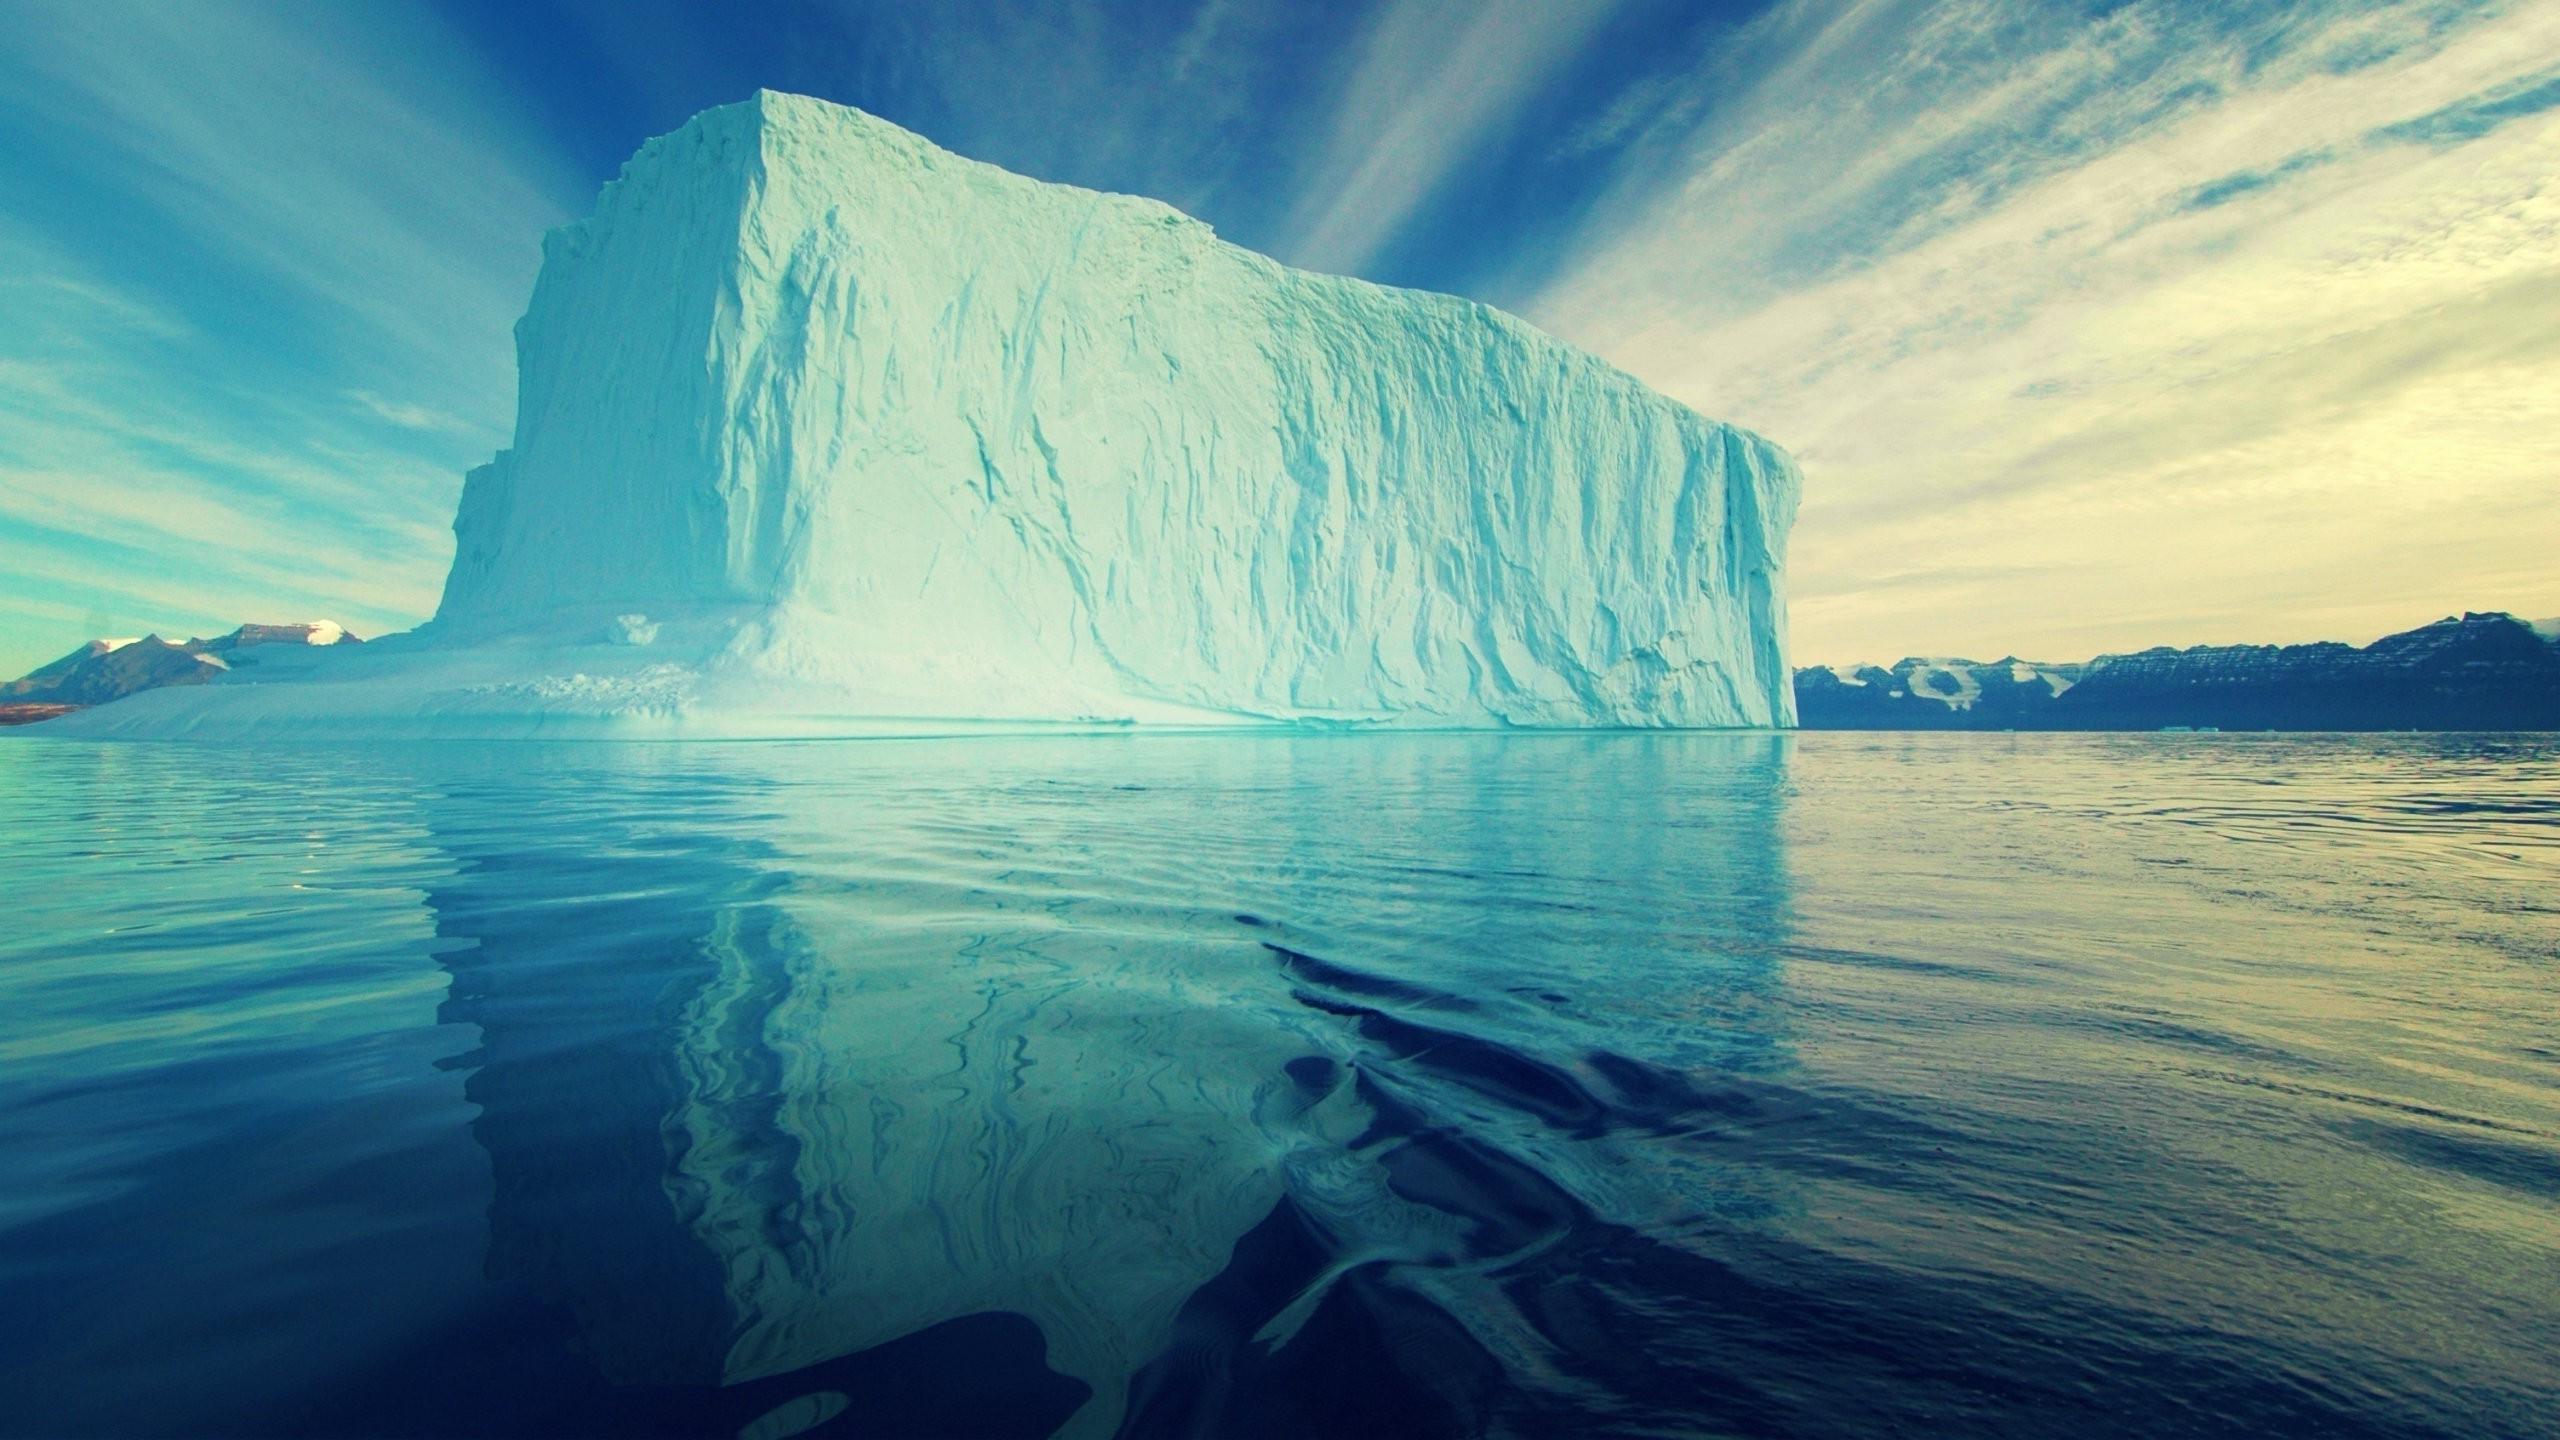 Wallpaper Landscape Nature Reflection Sky Snow Clouds Iceberg Calm Blue Glaciers Antarctica Horizon Arctic Freezing Melting Wave